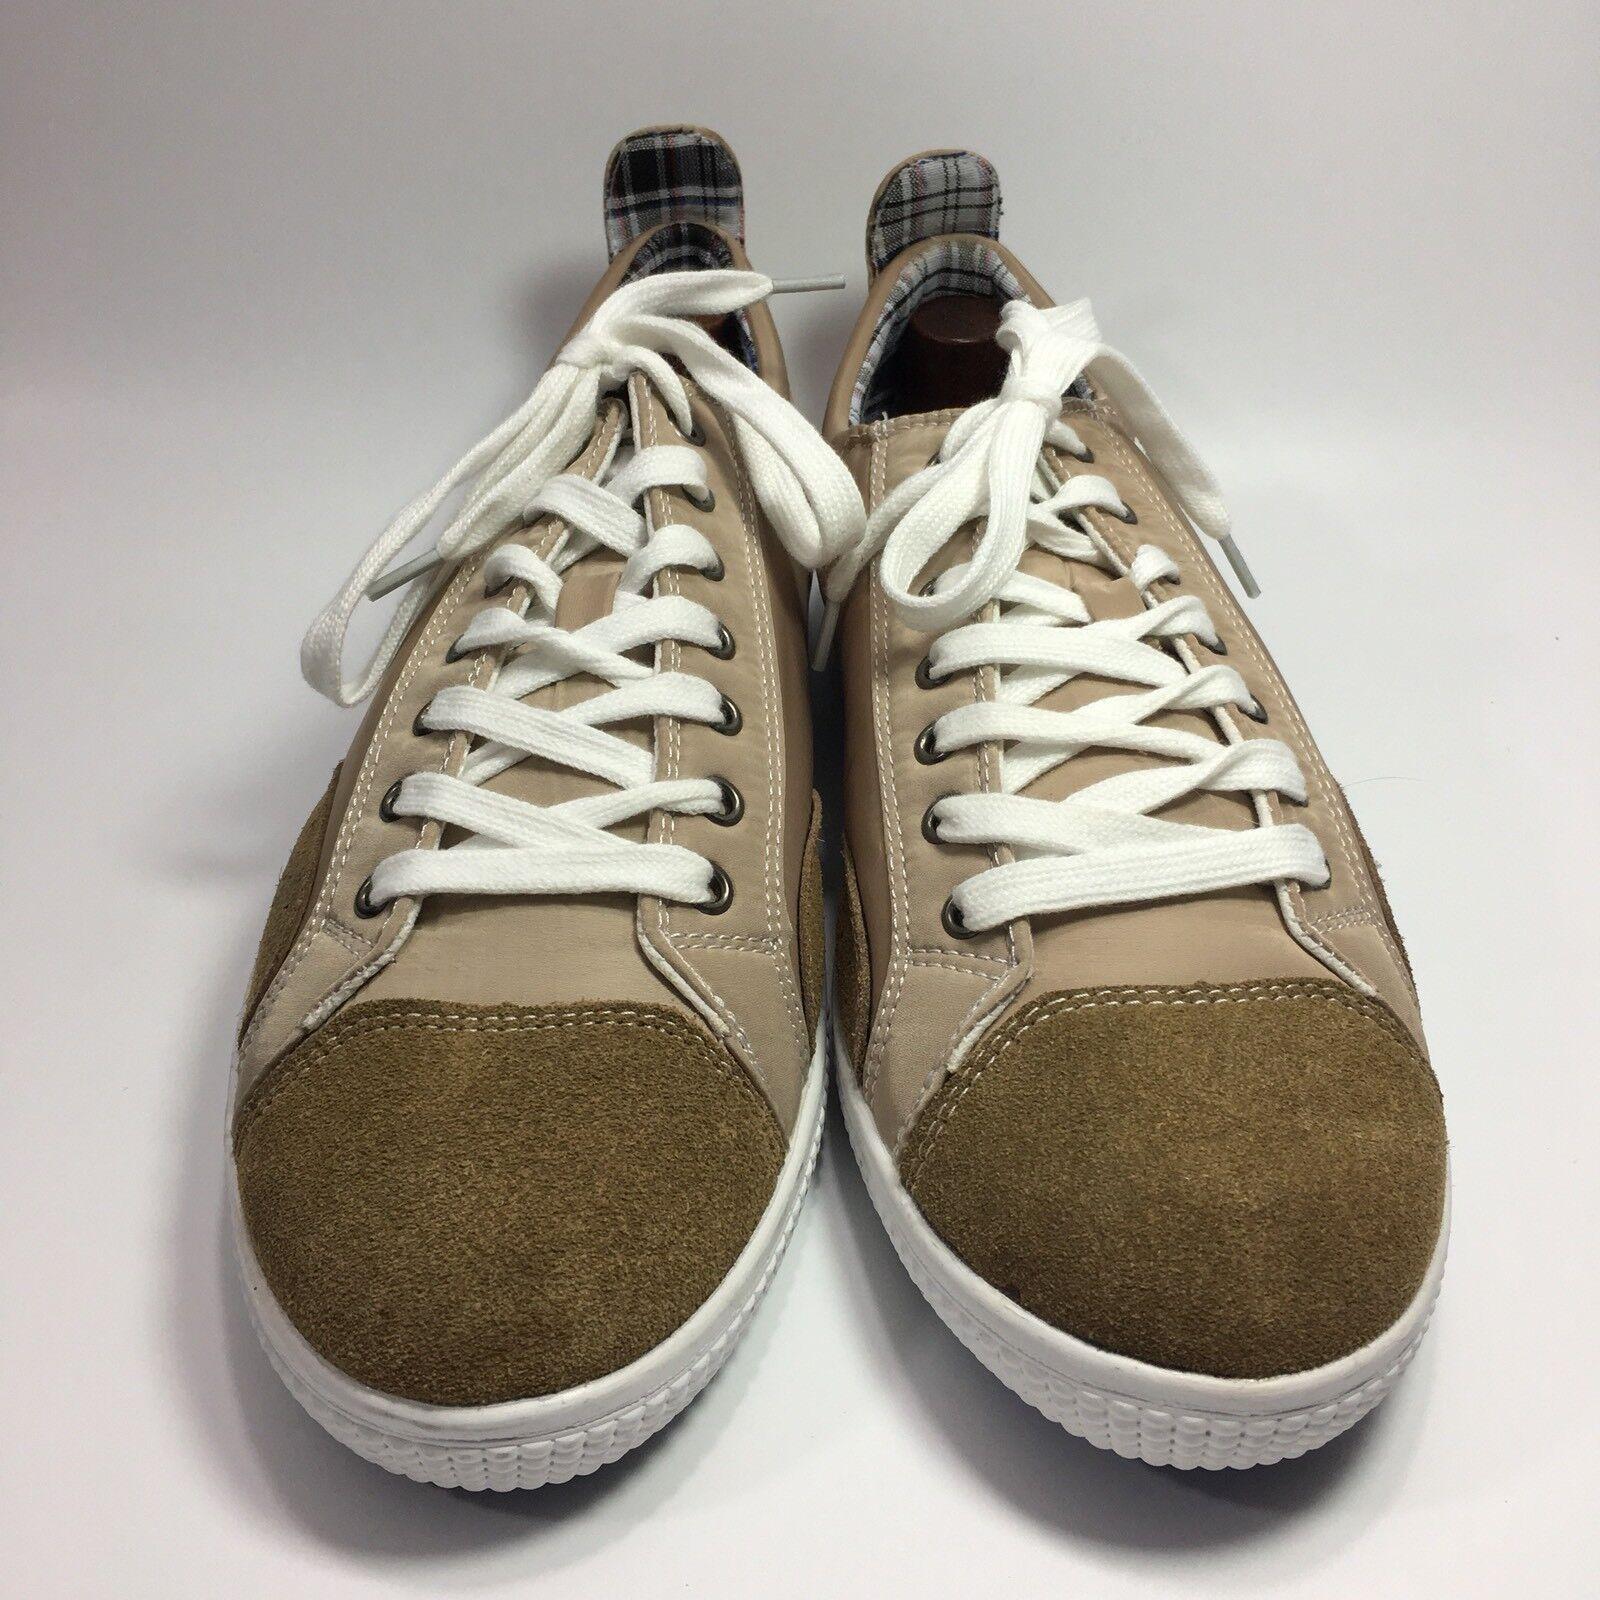 JOE'S JEANS Men's Schuhes Beige Suede/Nylon Fashion Sneakers Schuhes Men's Größe 10 NEW ccdcd2